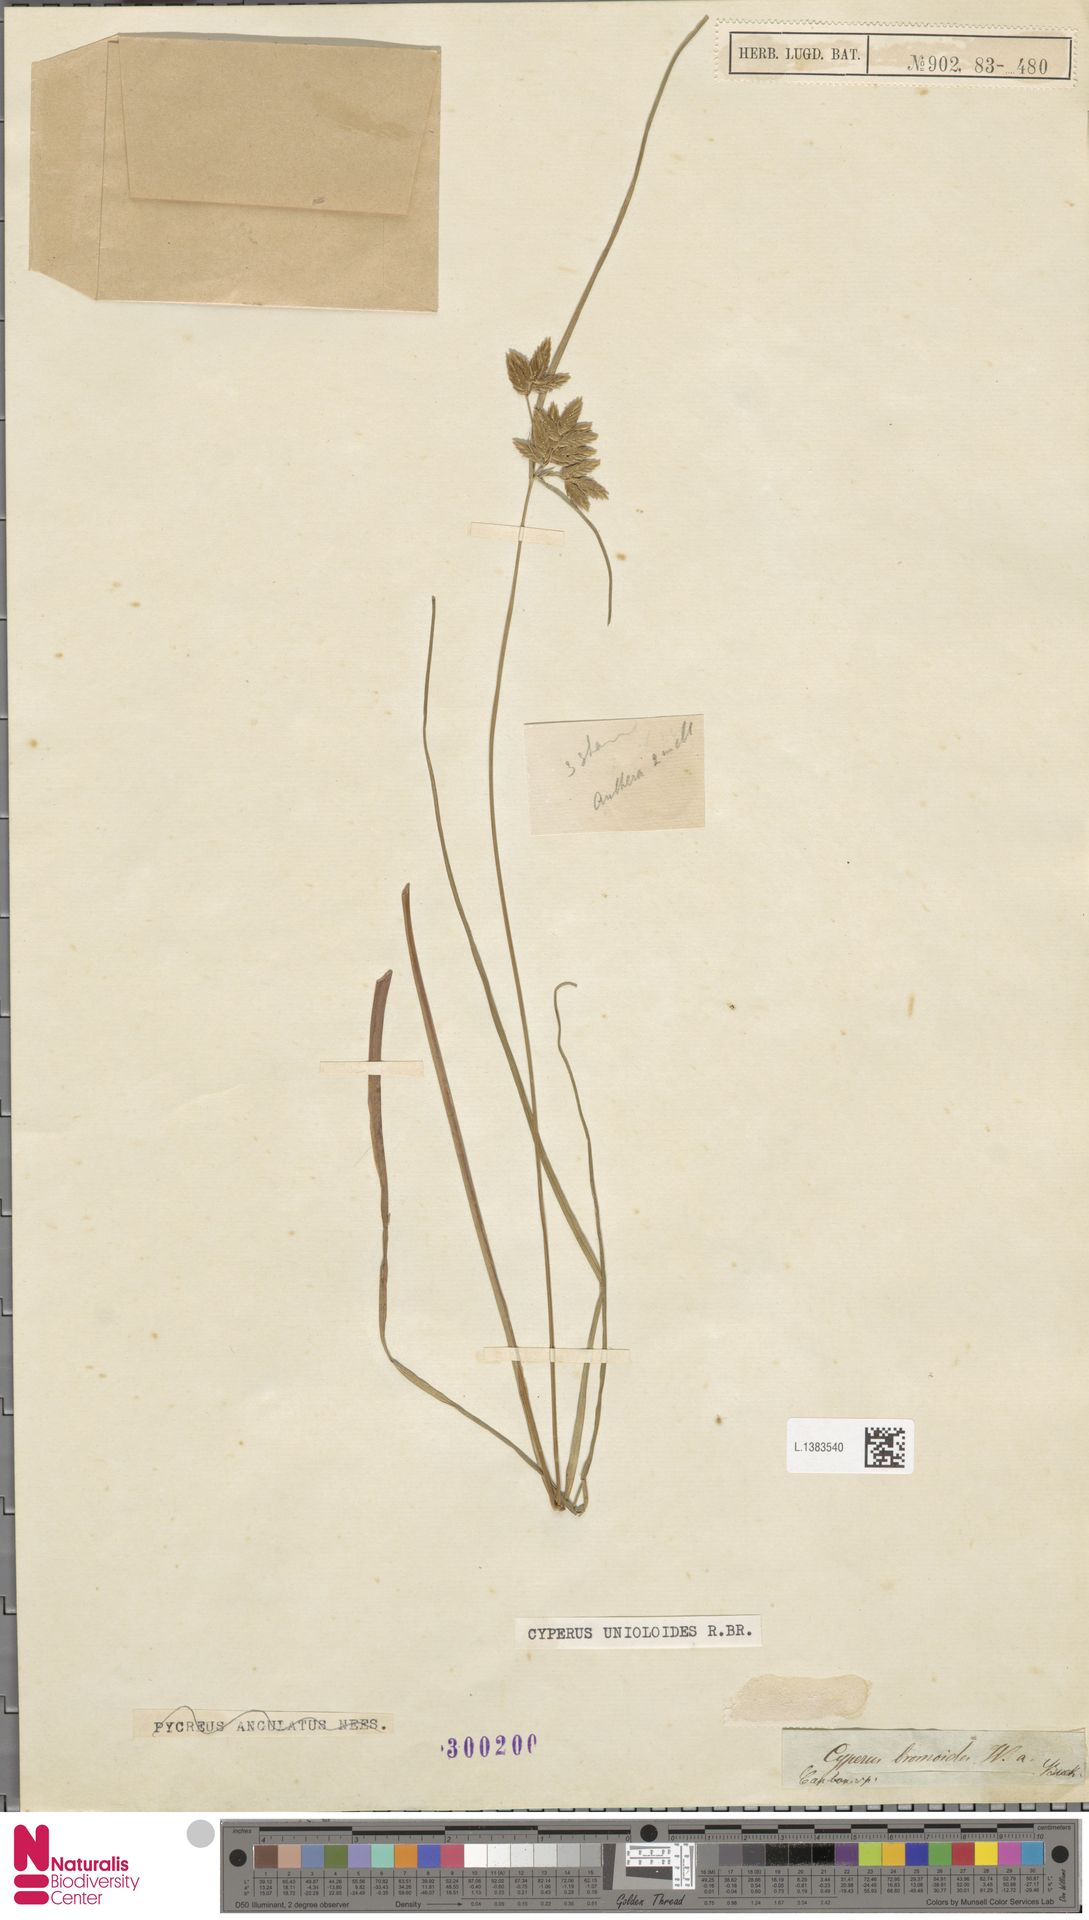 L.1383540 | Cyperus unioloides R.Br.